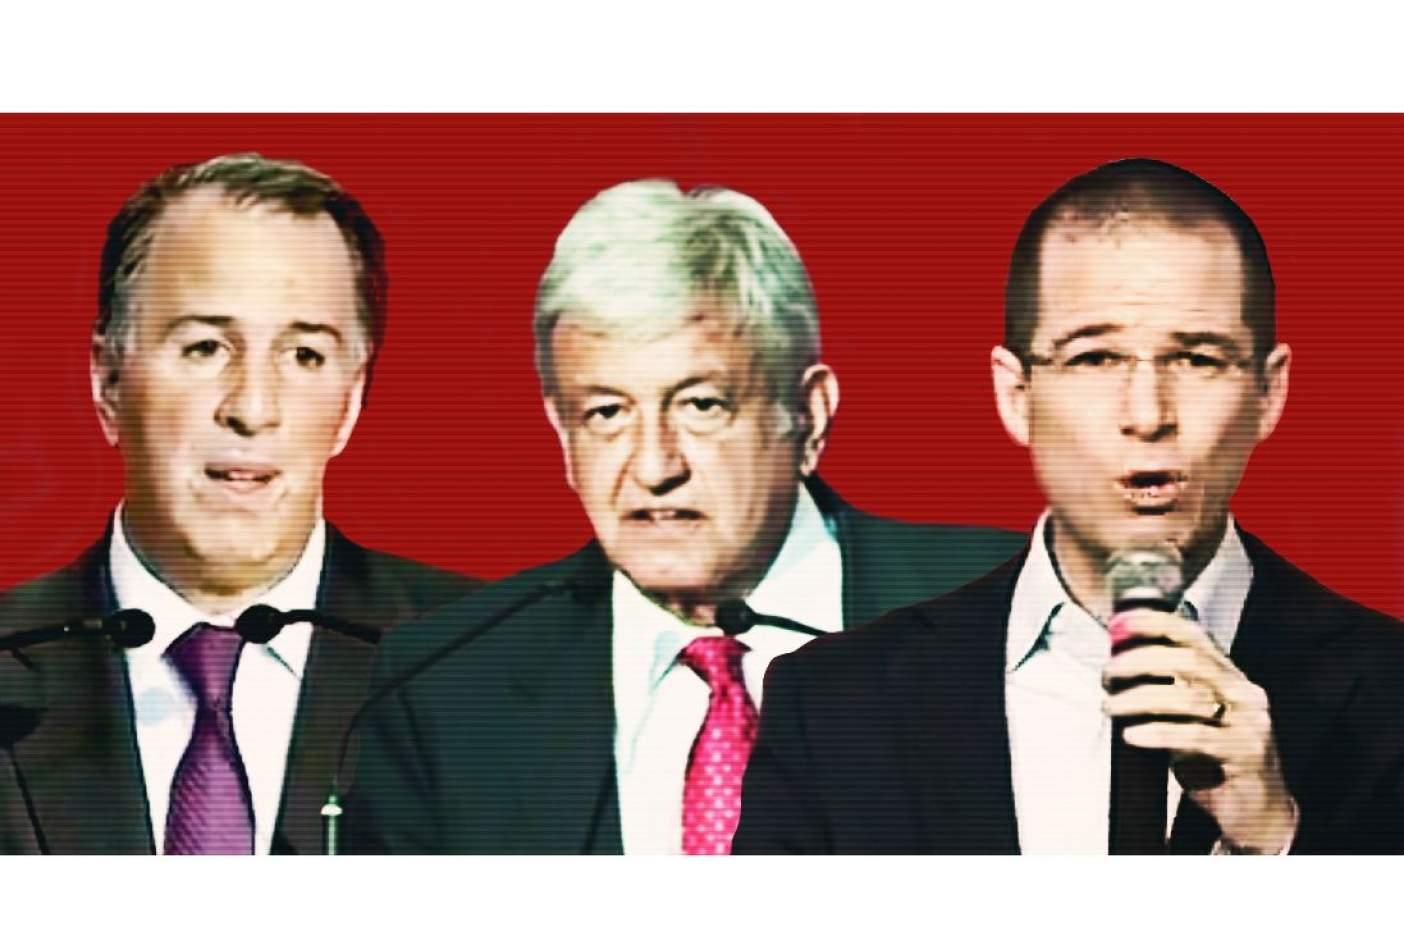 Recomendamos: El tigre de López Obrador, por Héctor Aguilar Camín